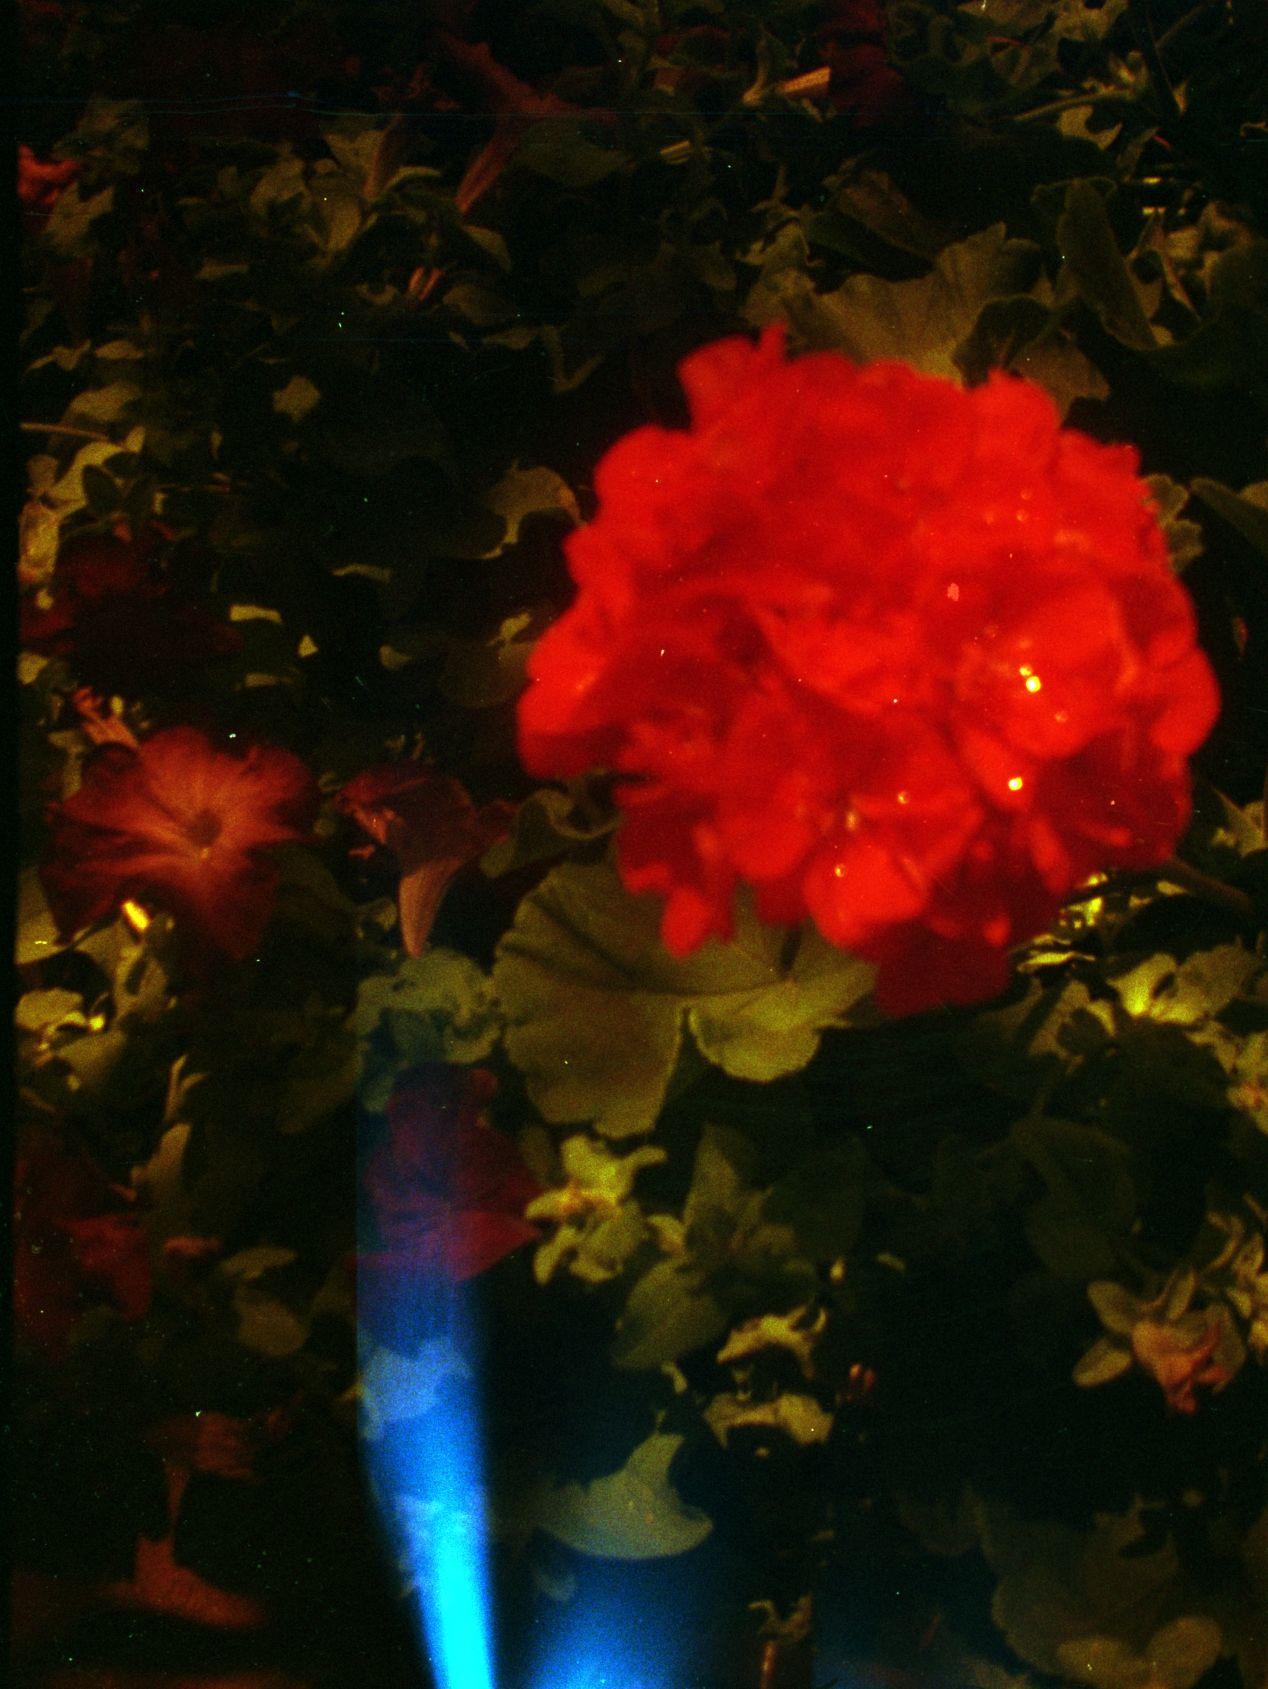 Flipped (redscale) Lomography Color Negative 400 on Diana Mini.